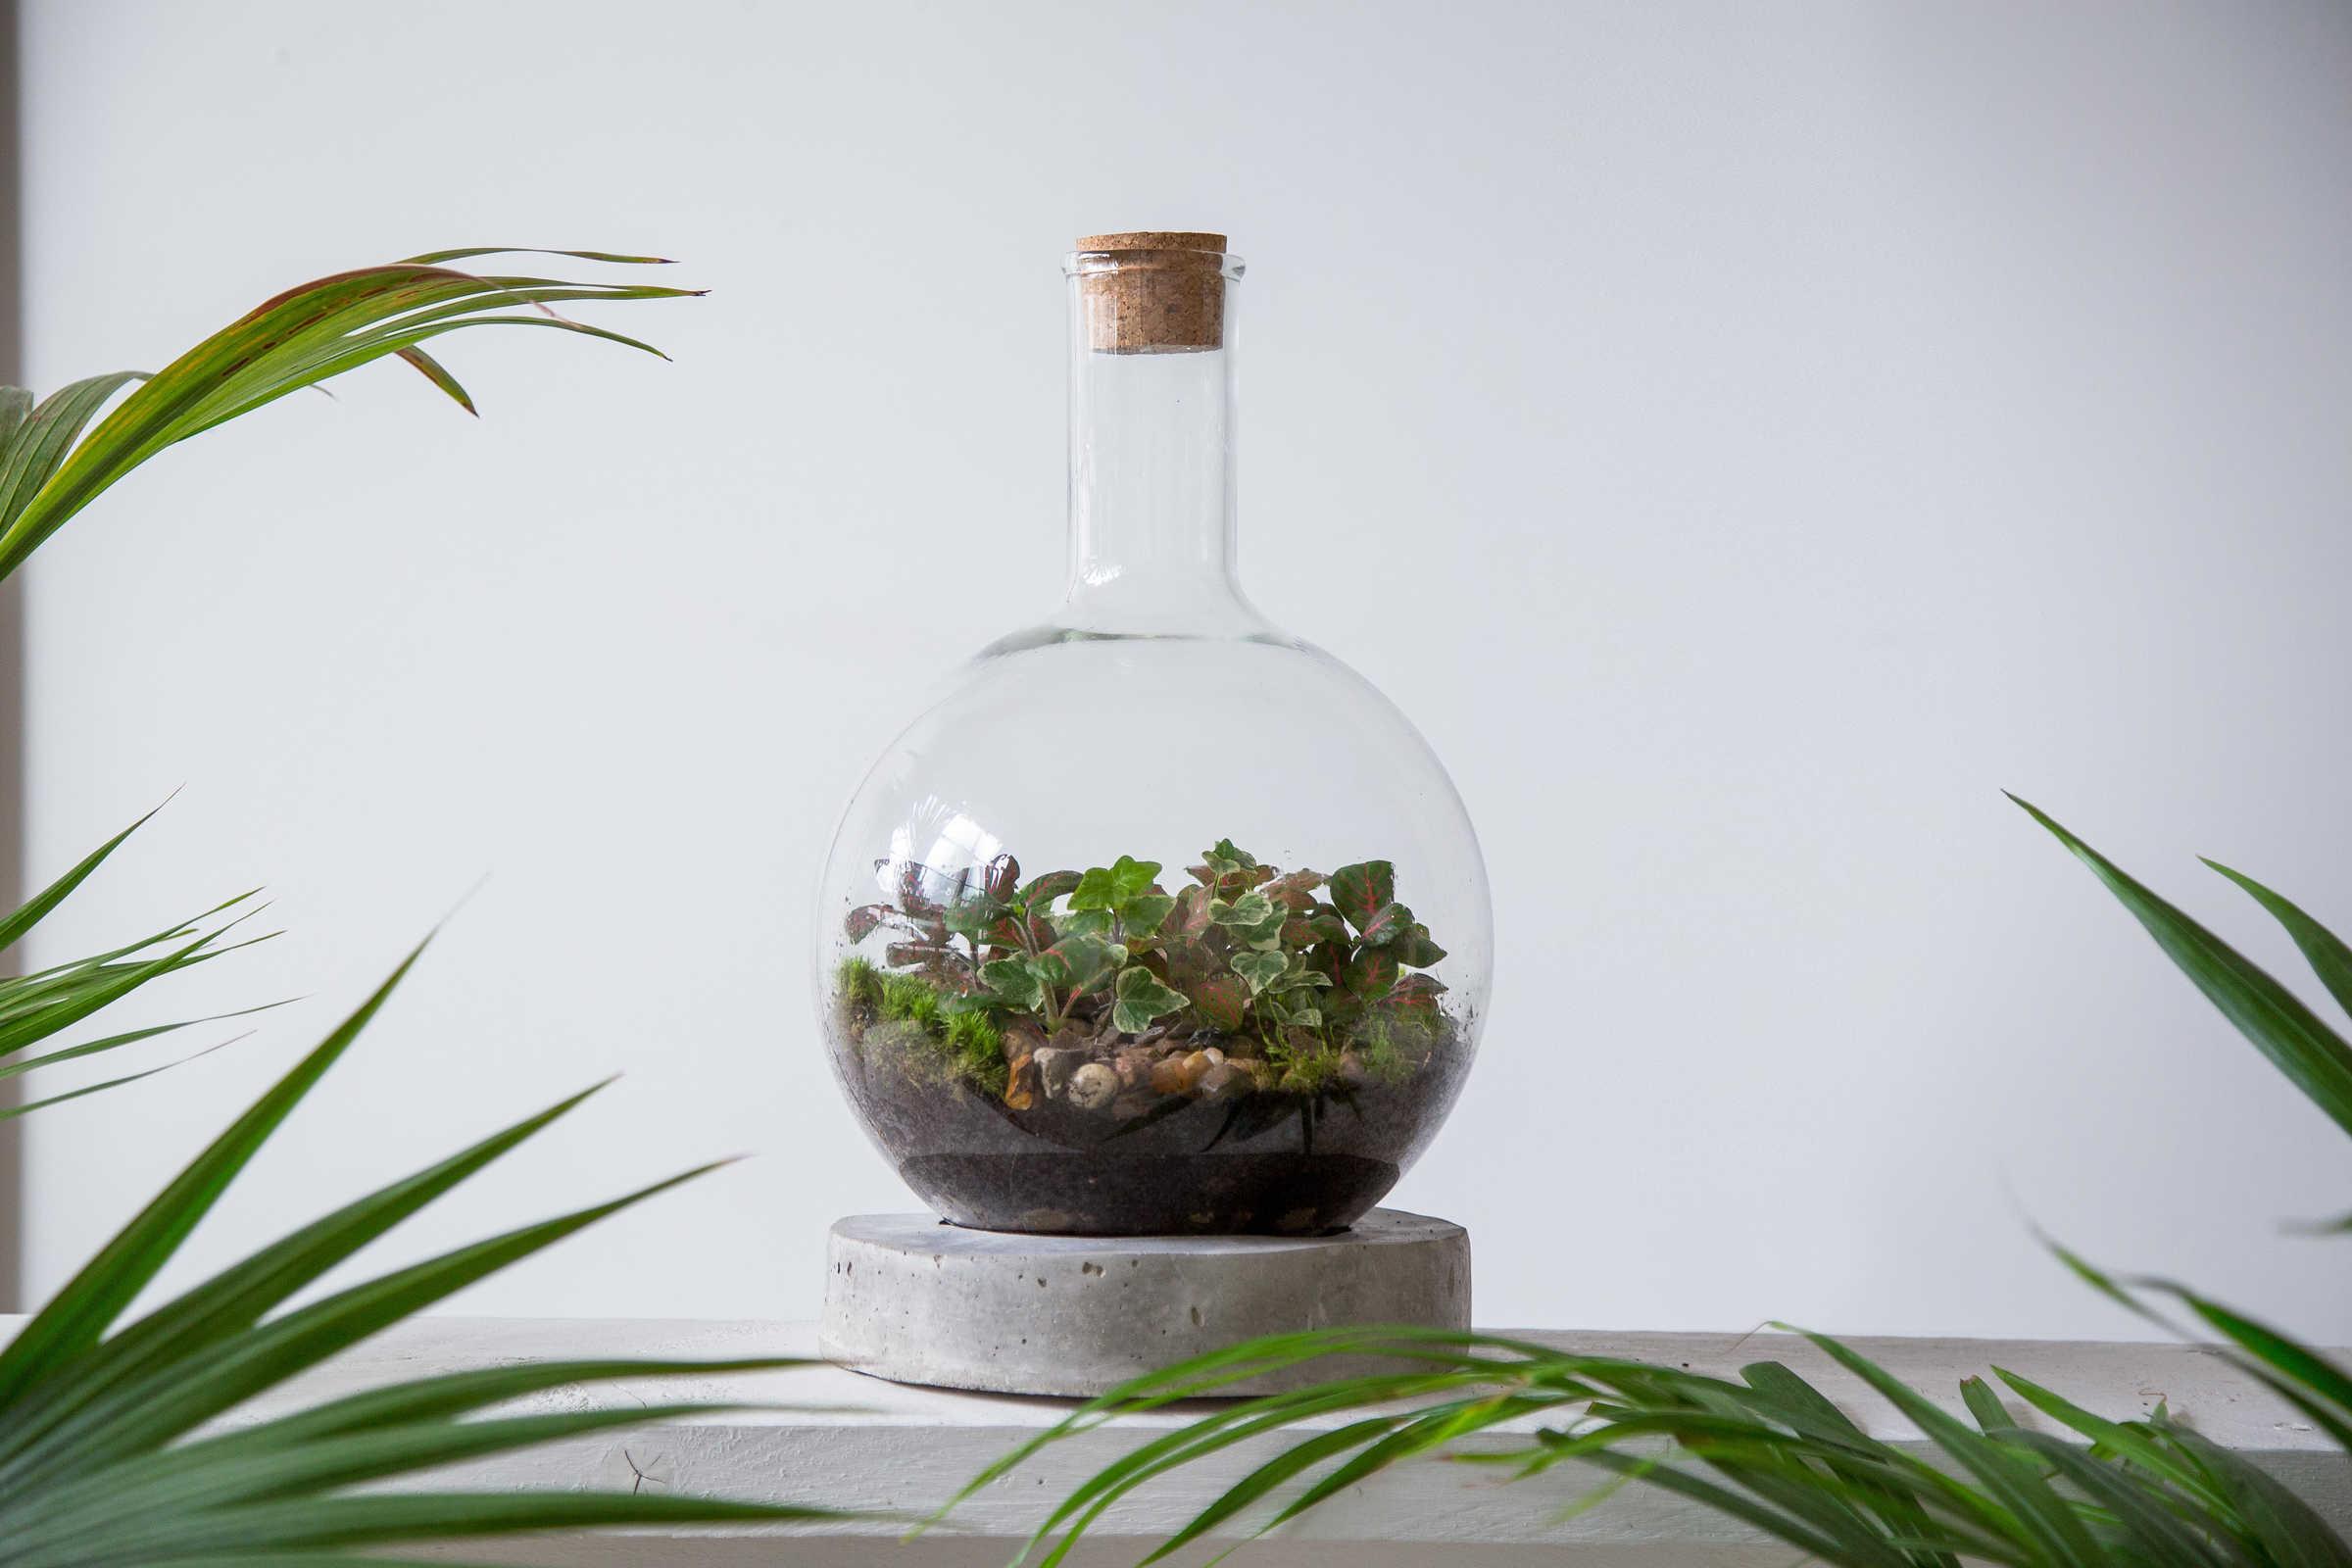 Heal's-modern-craft-market-made-in-london-london-terrariums